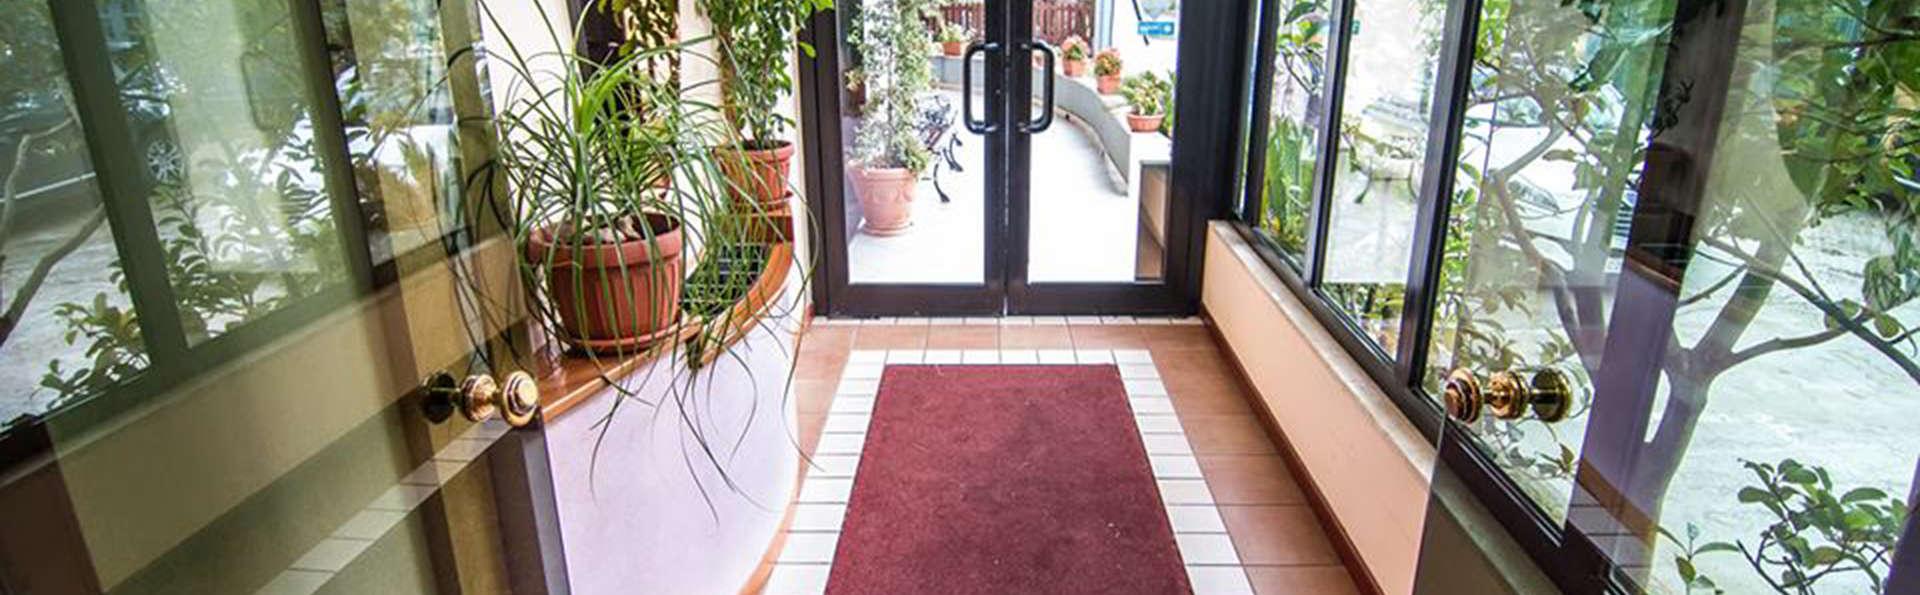 Hotel Murgia - EDIT_entry.jpg